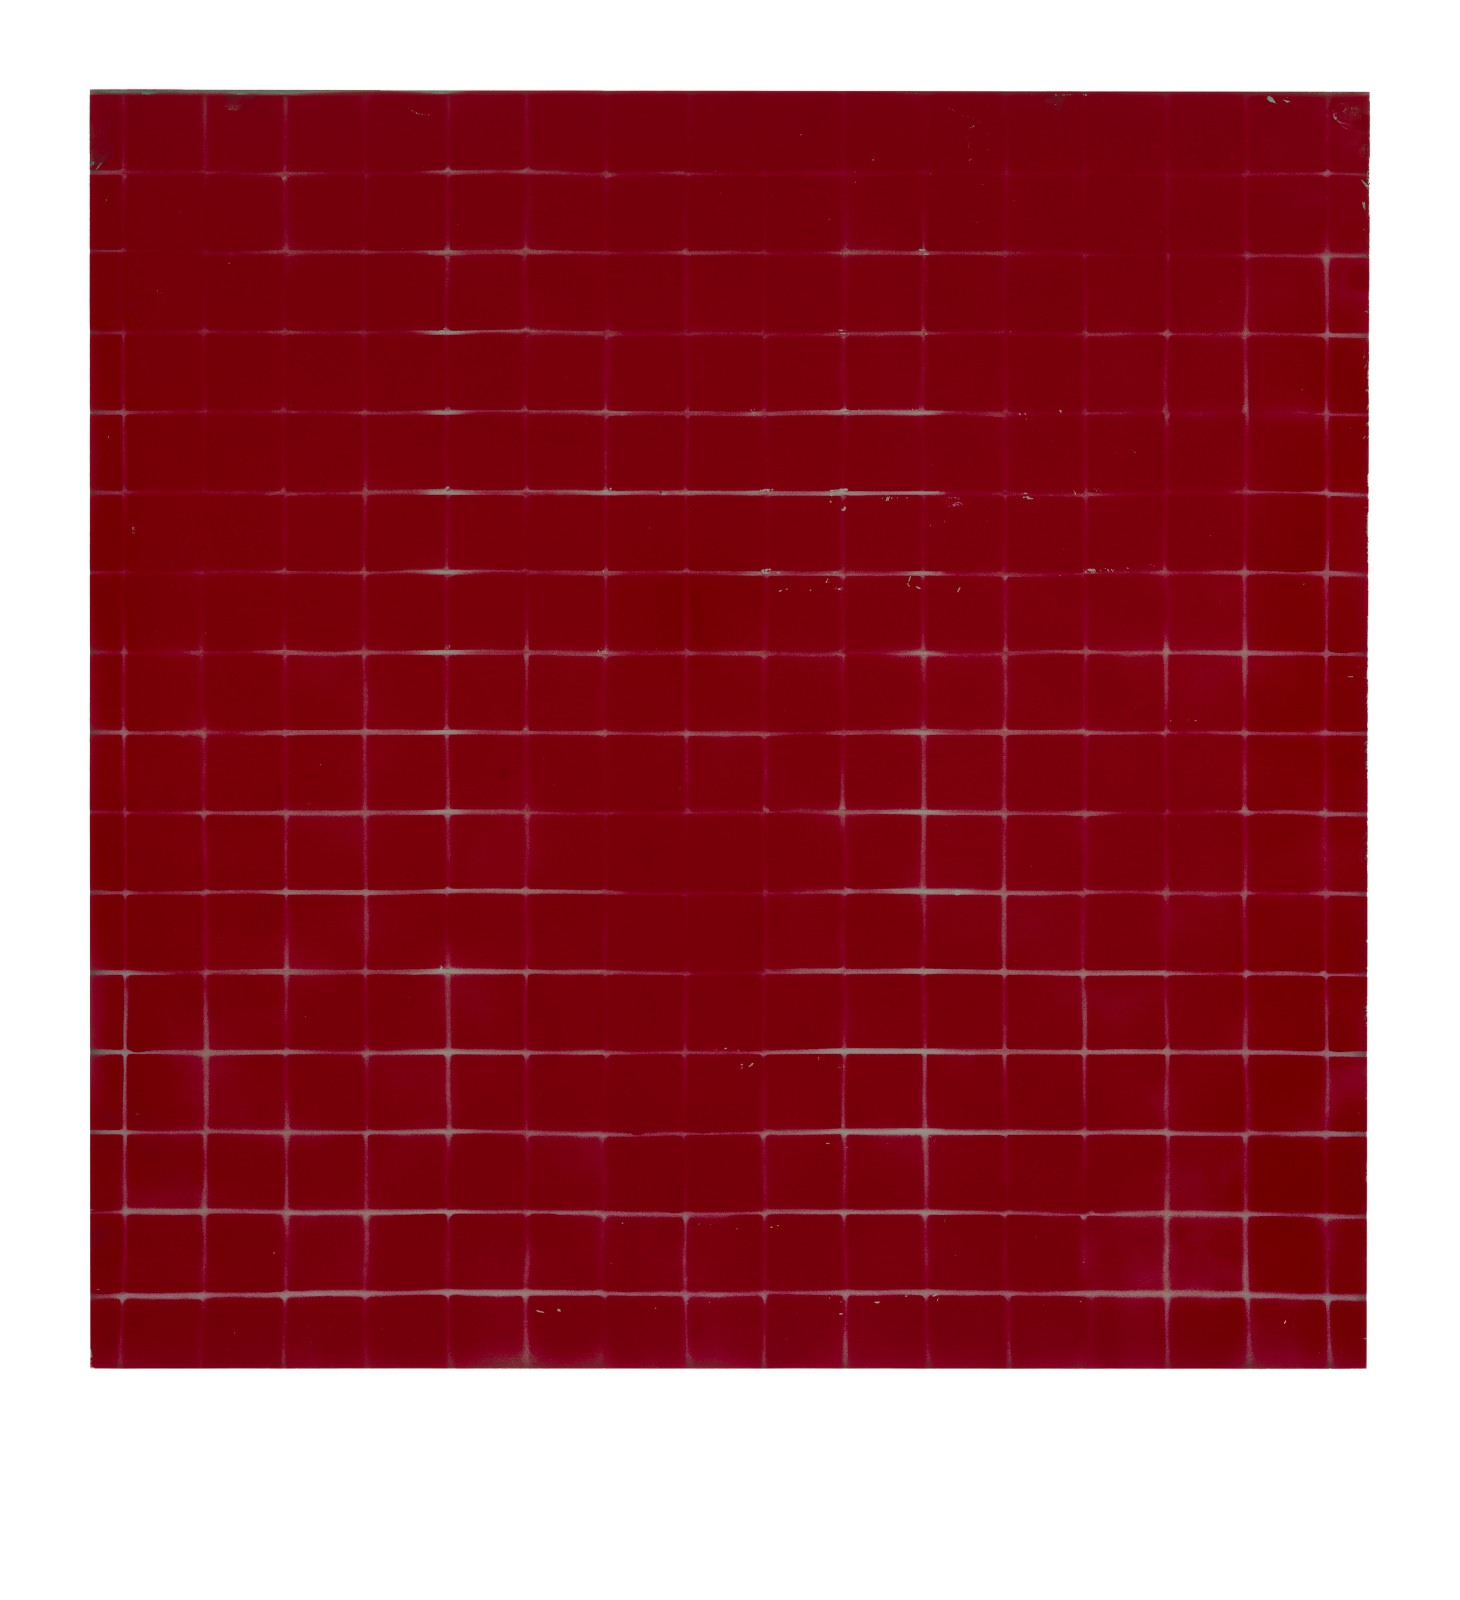 "STAIN : 40°42'44.1""N 73°56'11.1""W, 2015, spraypaint on aluminium, 81,3 x 81,3 cm"